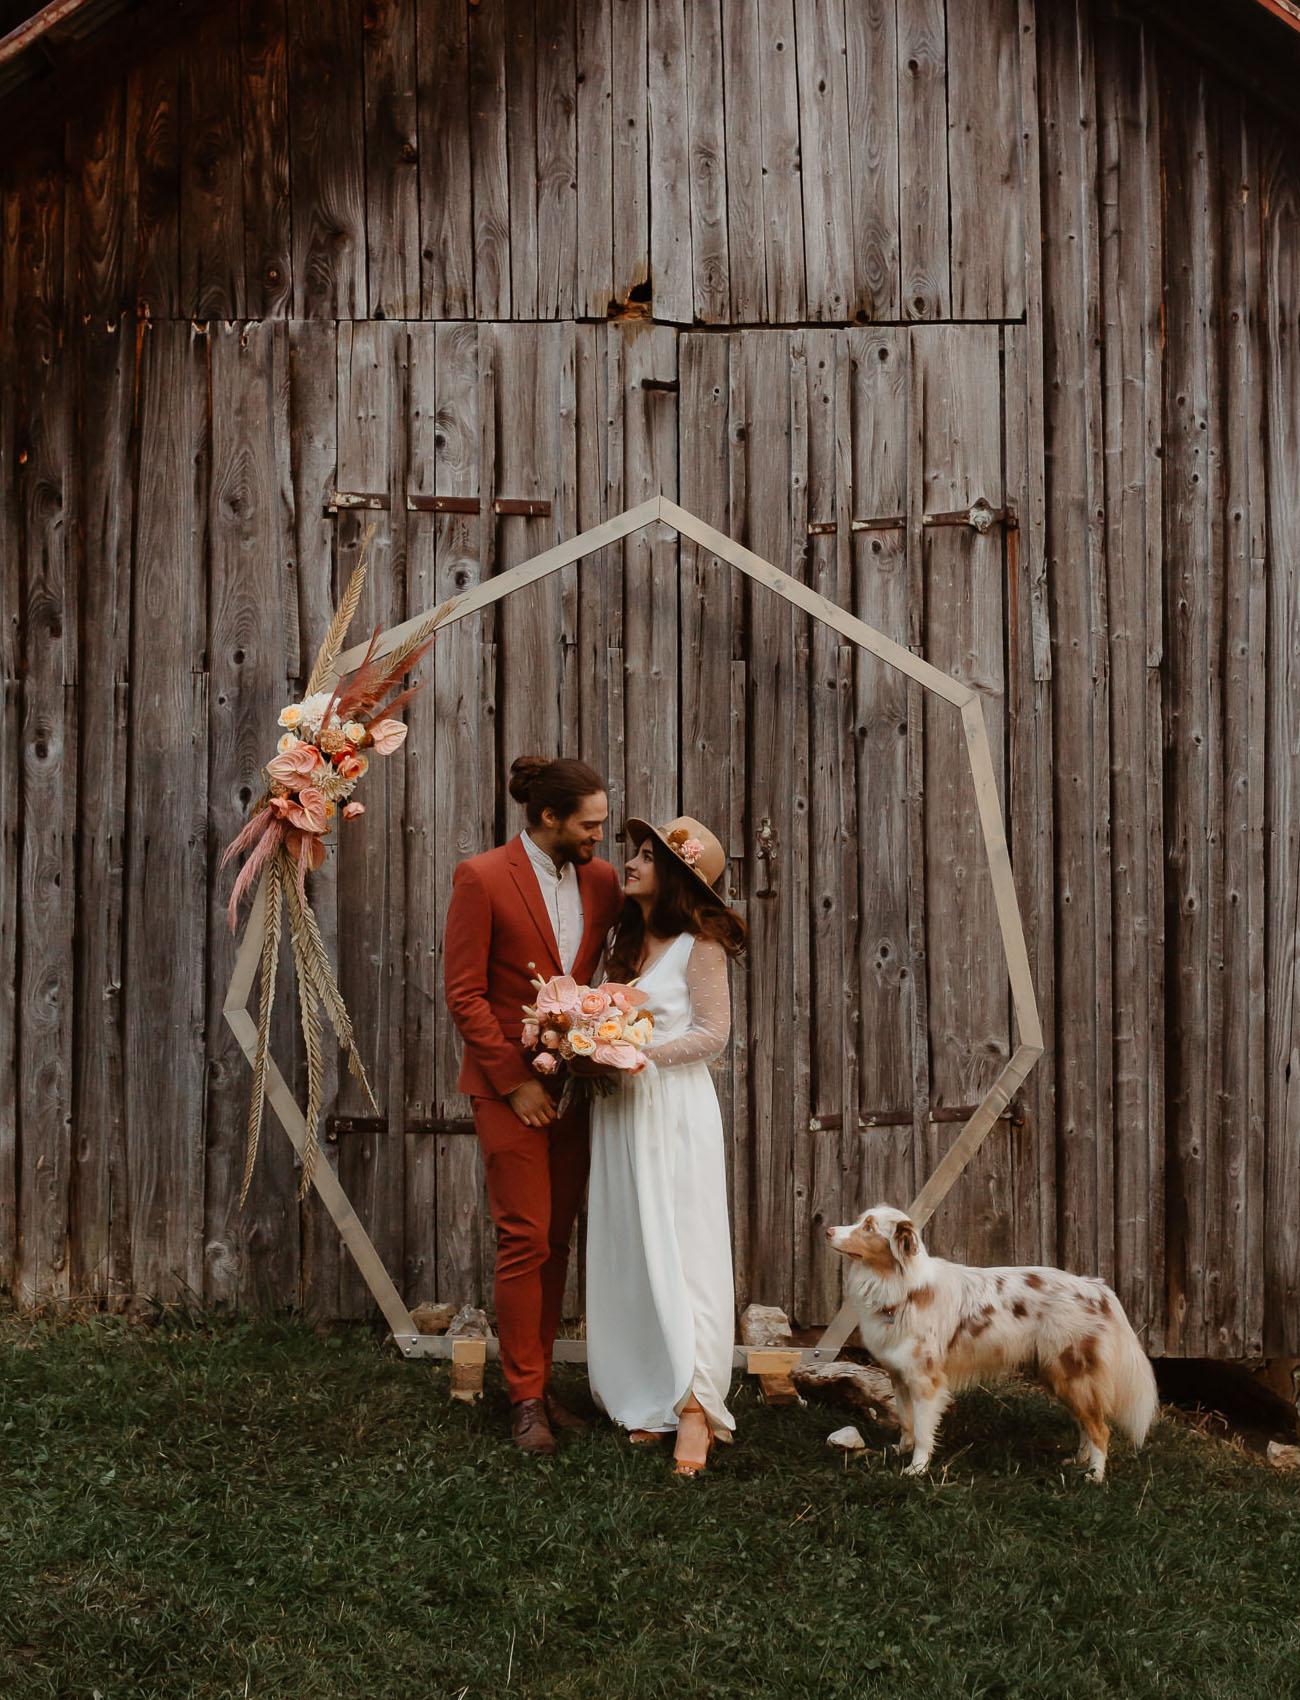 Modern-hexagonal-wedding-arch-69680